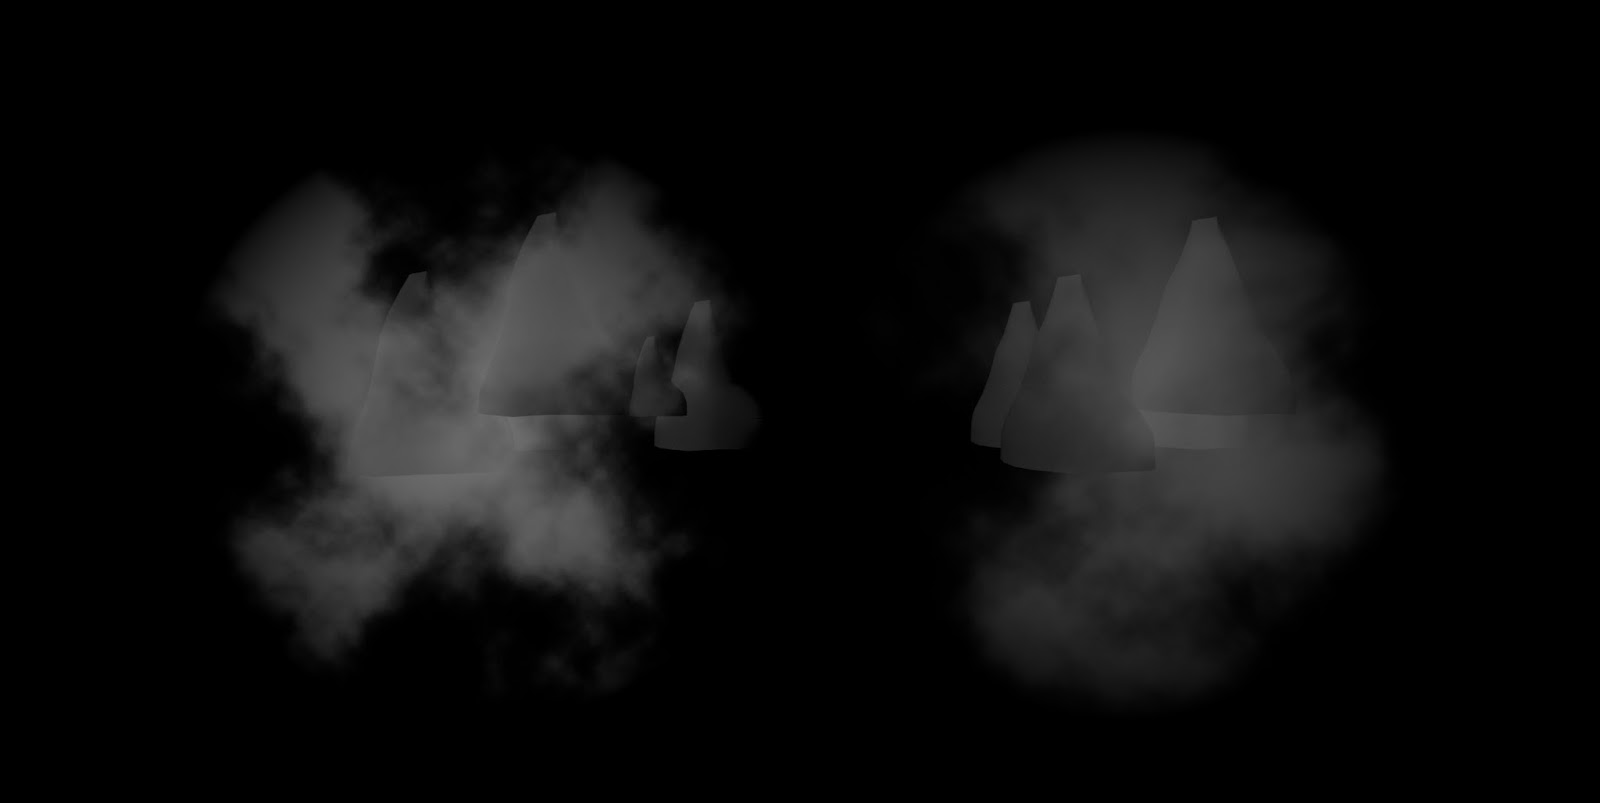 UE4 fog Sheet (left) and my optimized fog sheet (right)